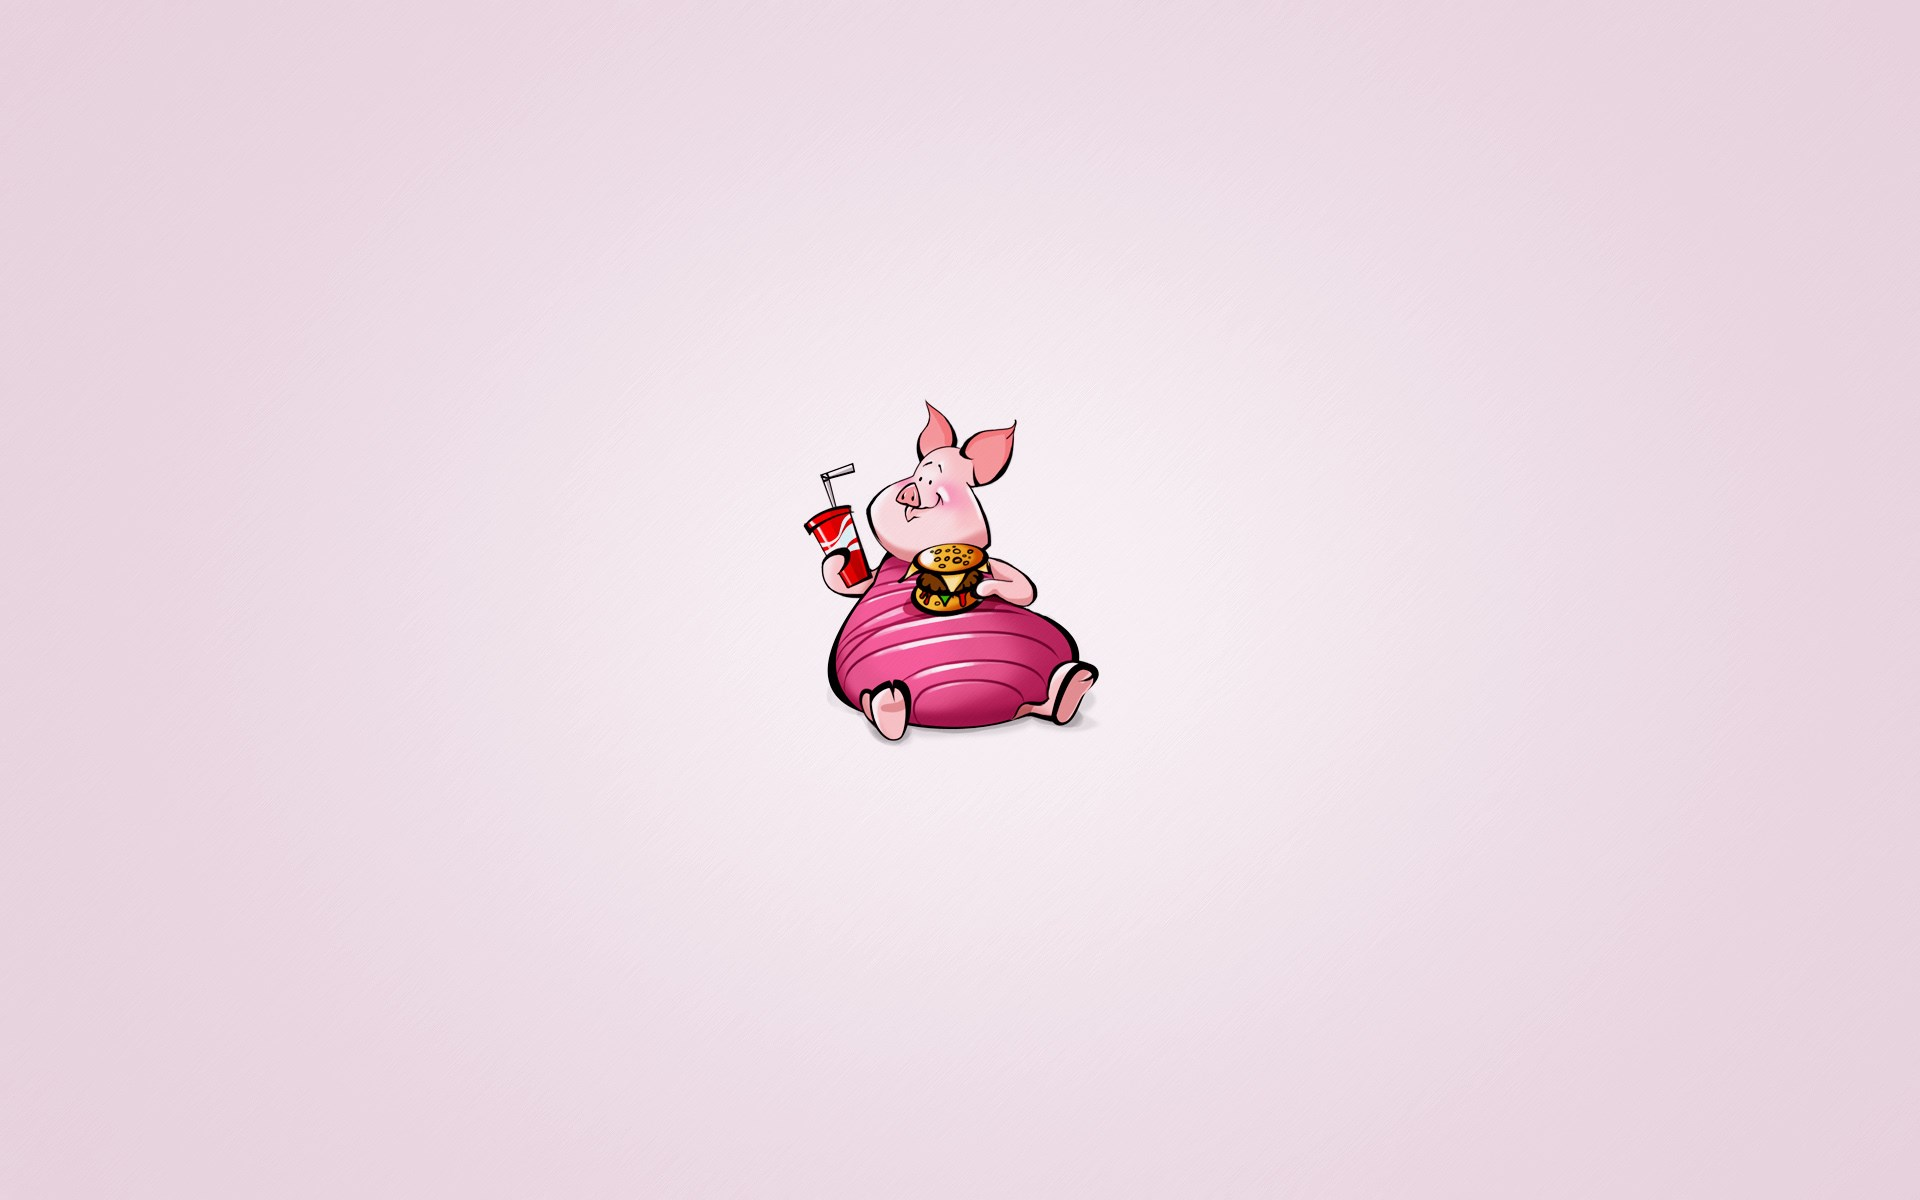 Winnie-the-Pooh Piglet Drink Burger Cartoon Funny